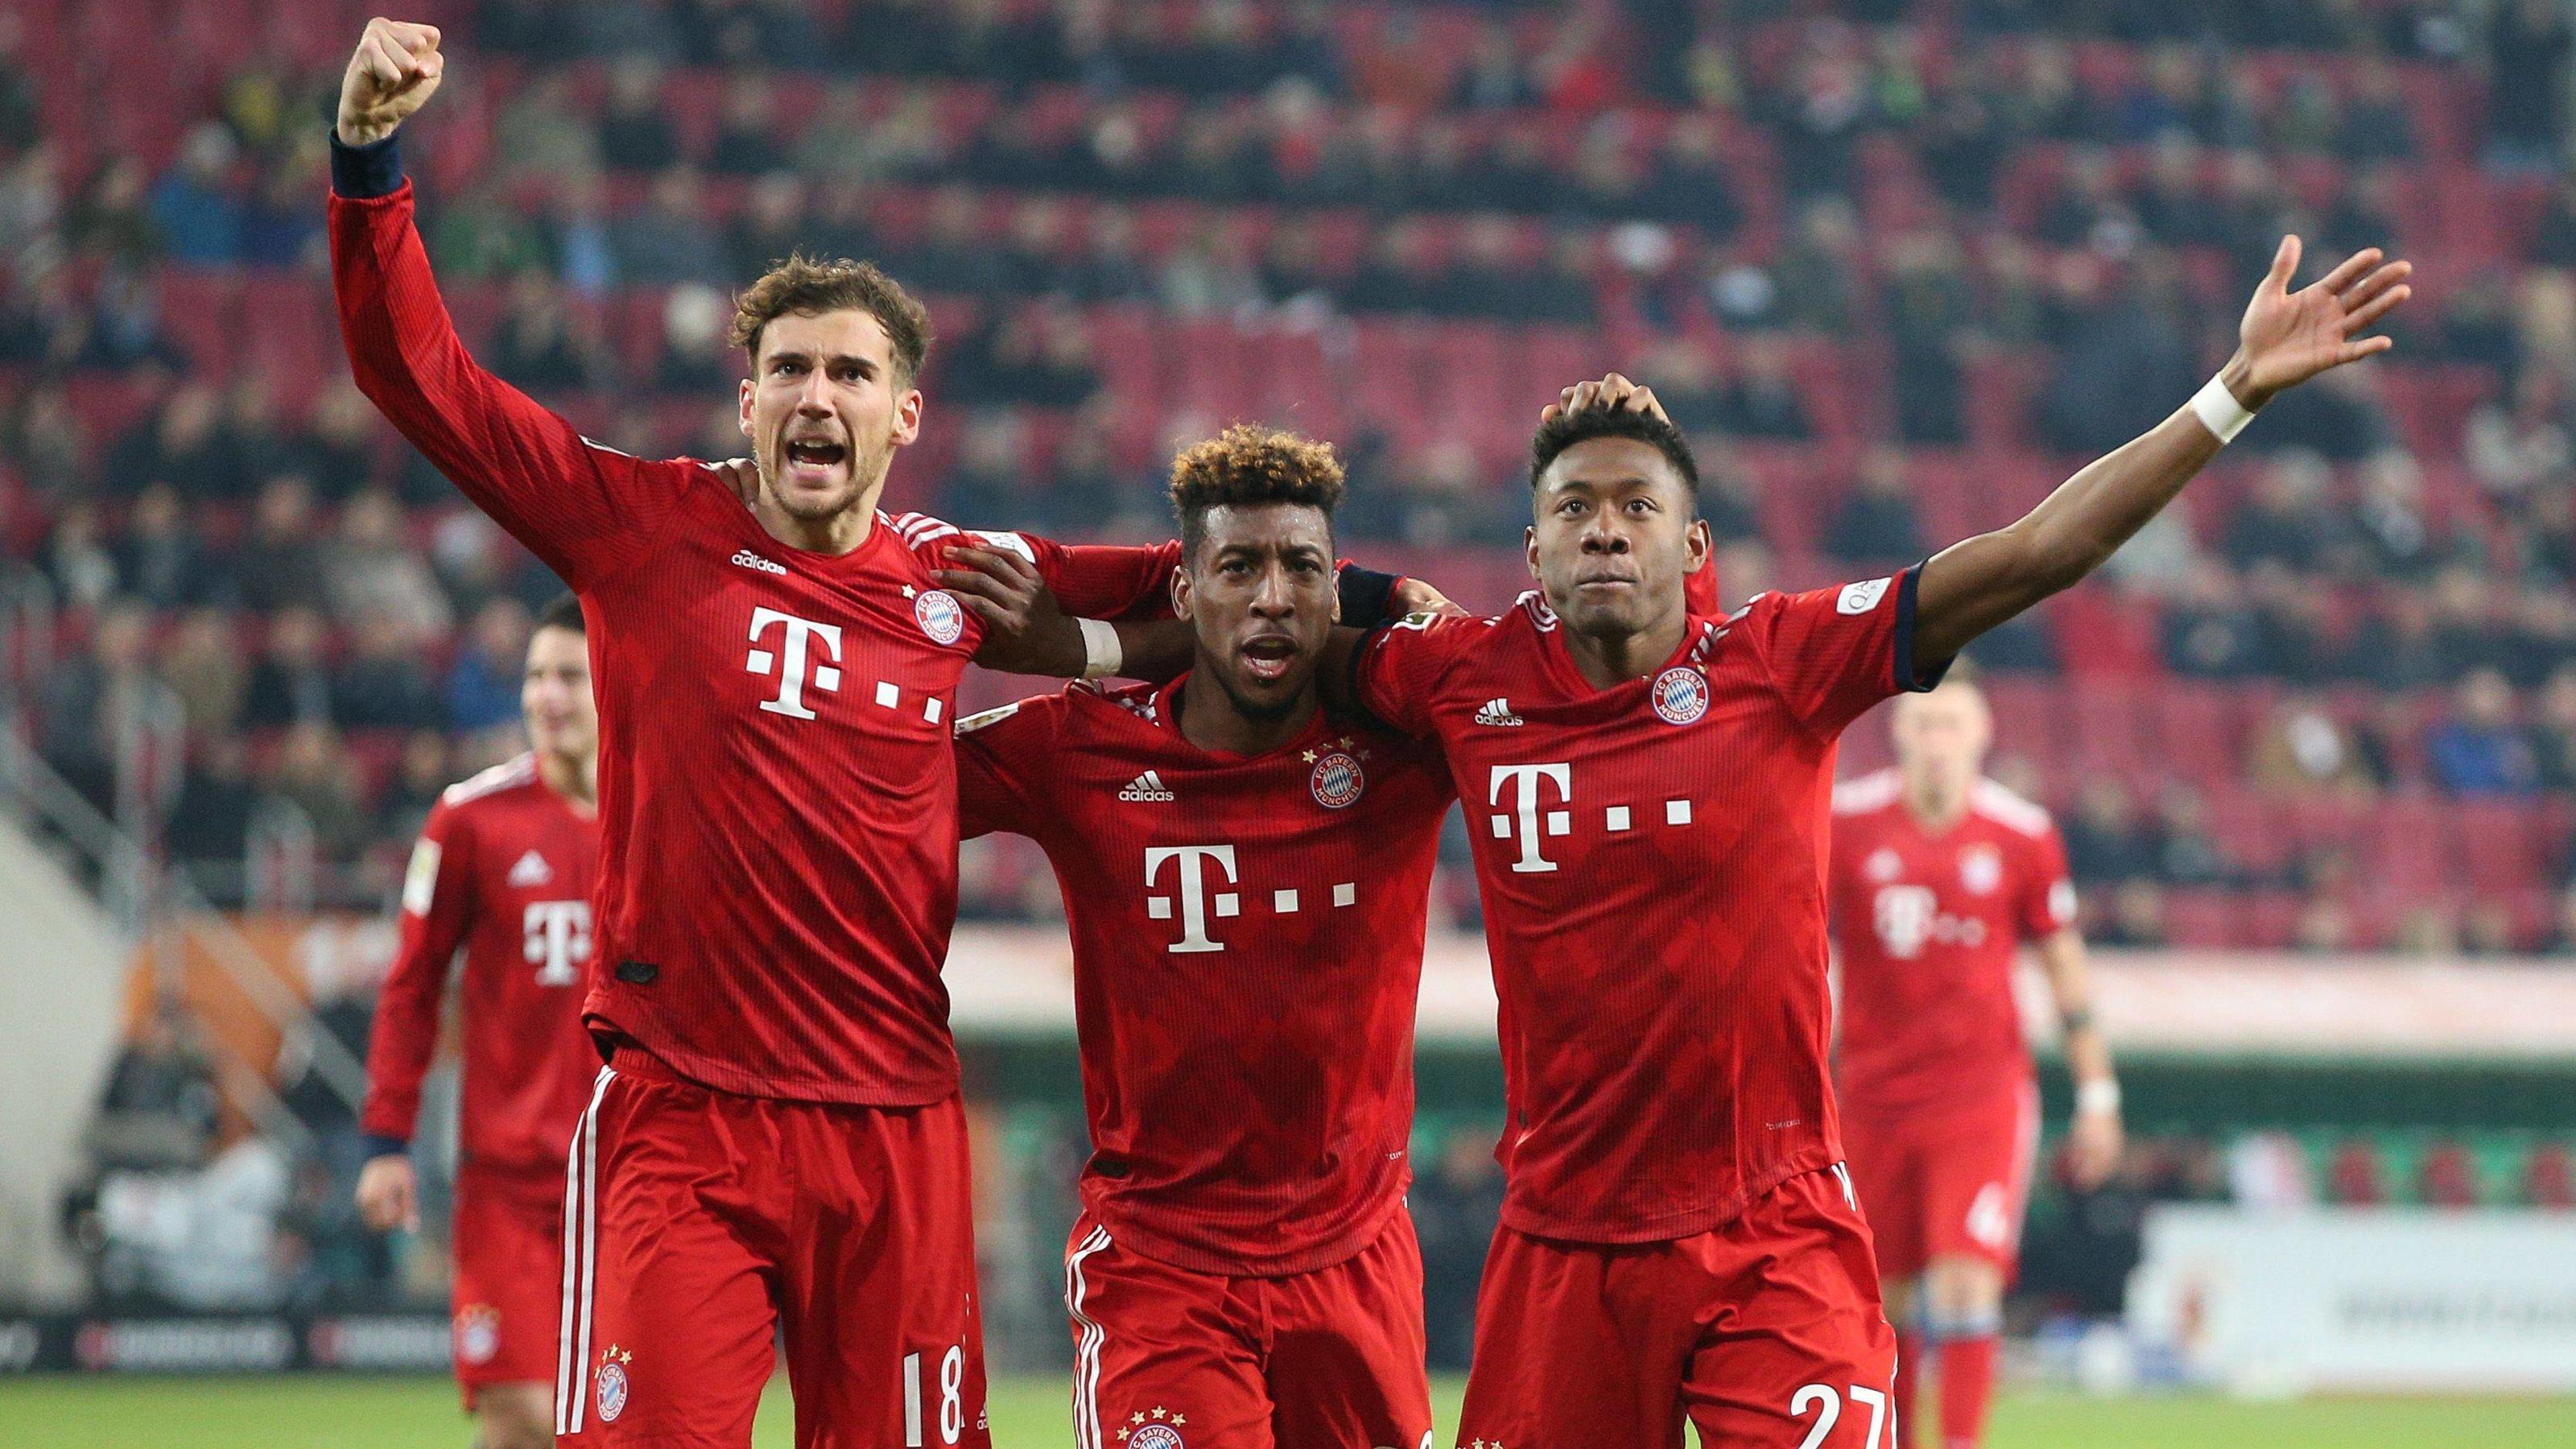 Bayern Augsburg 2:1